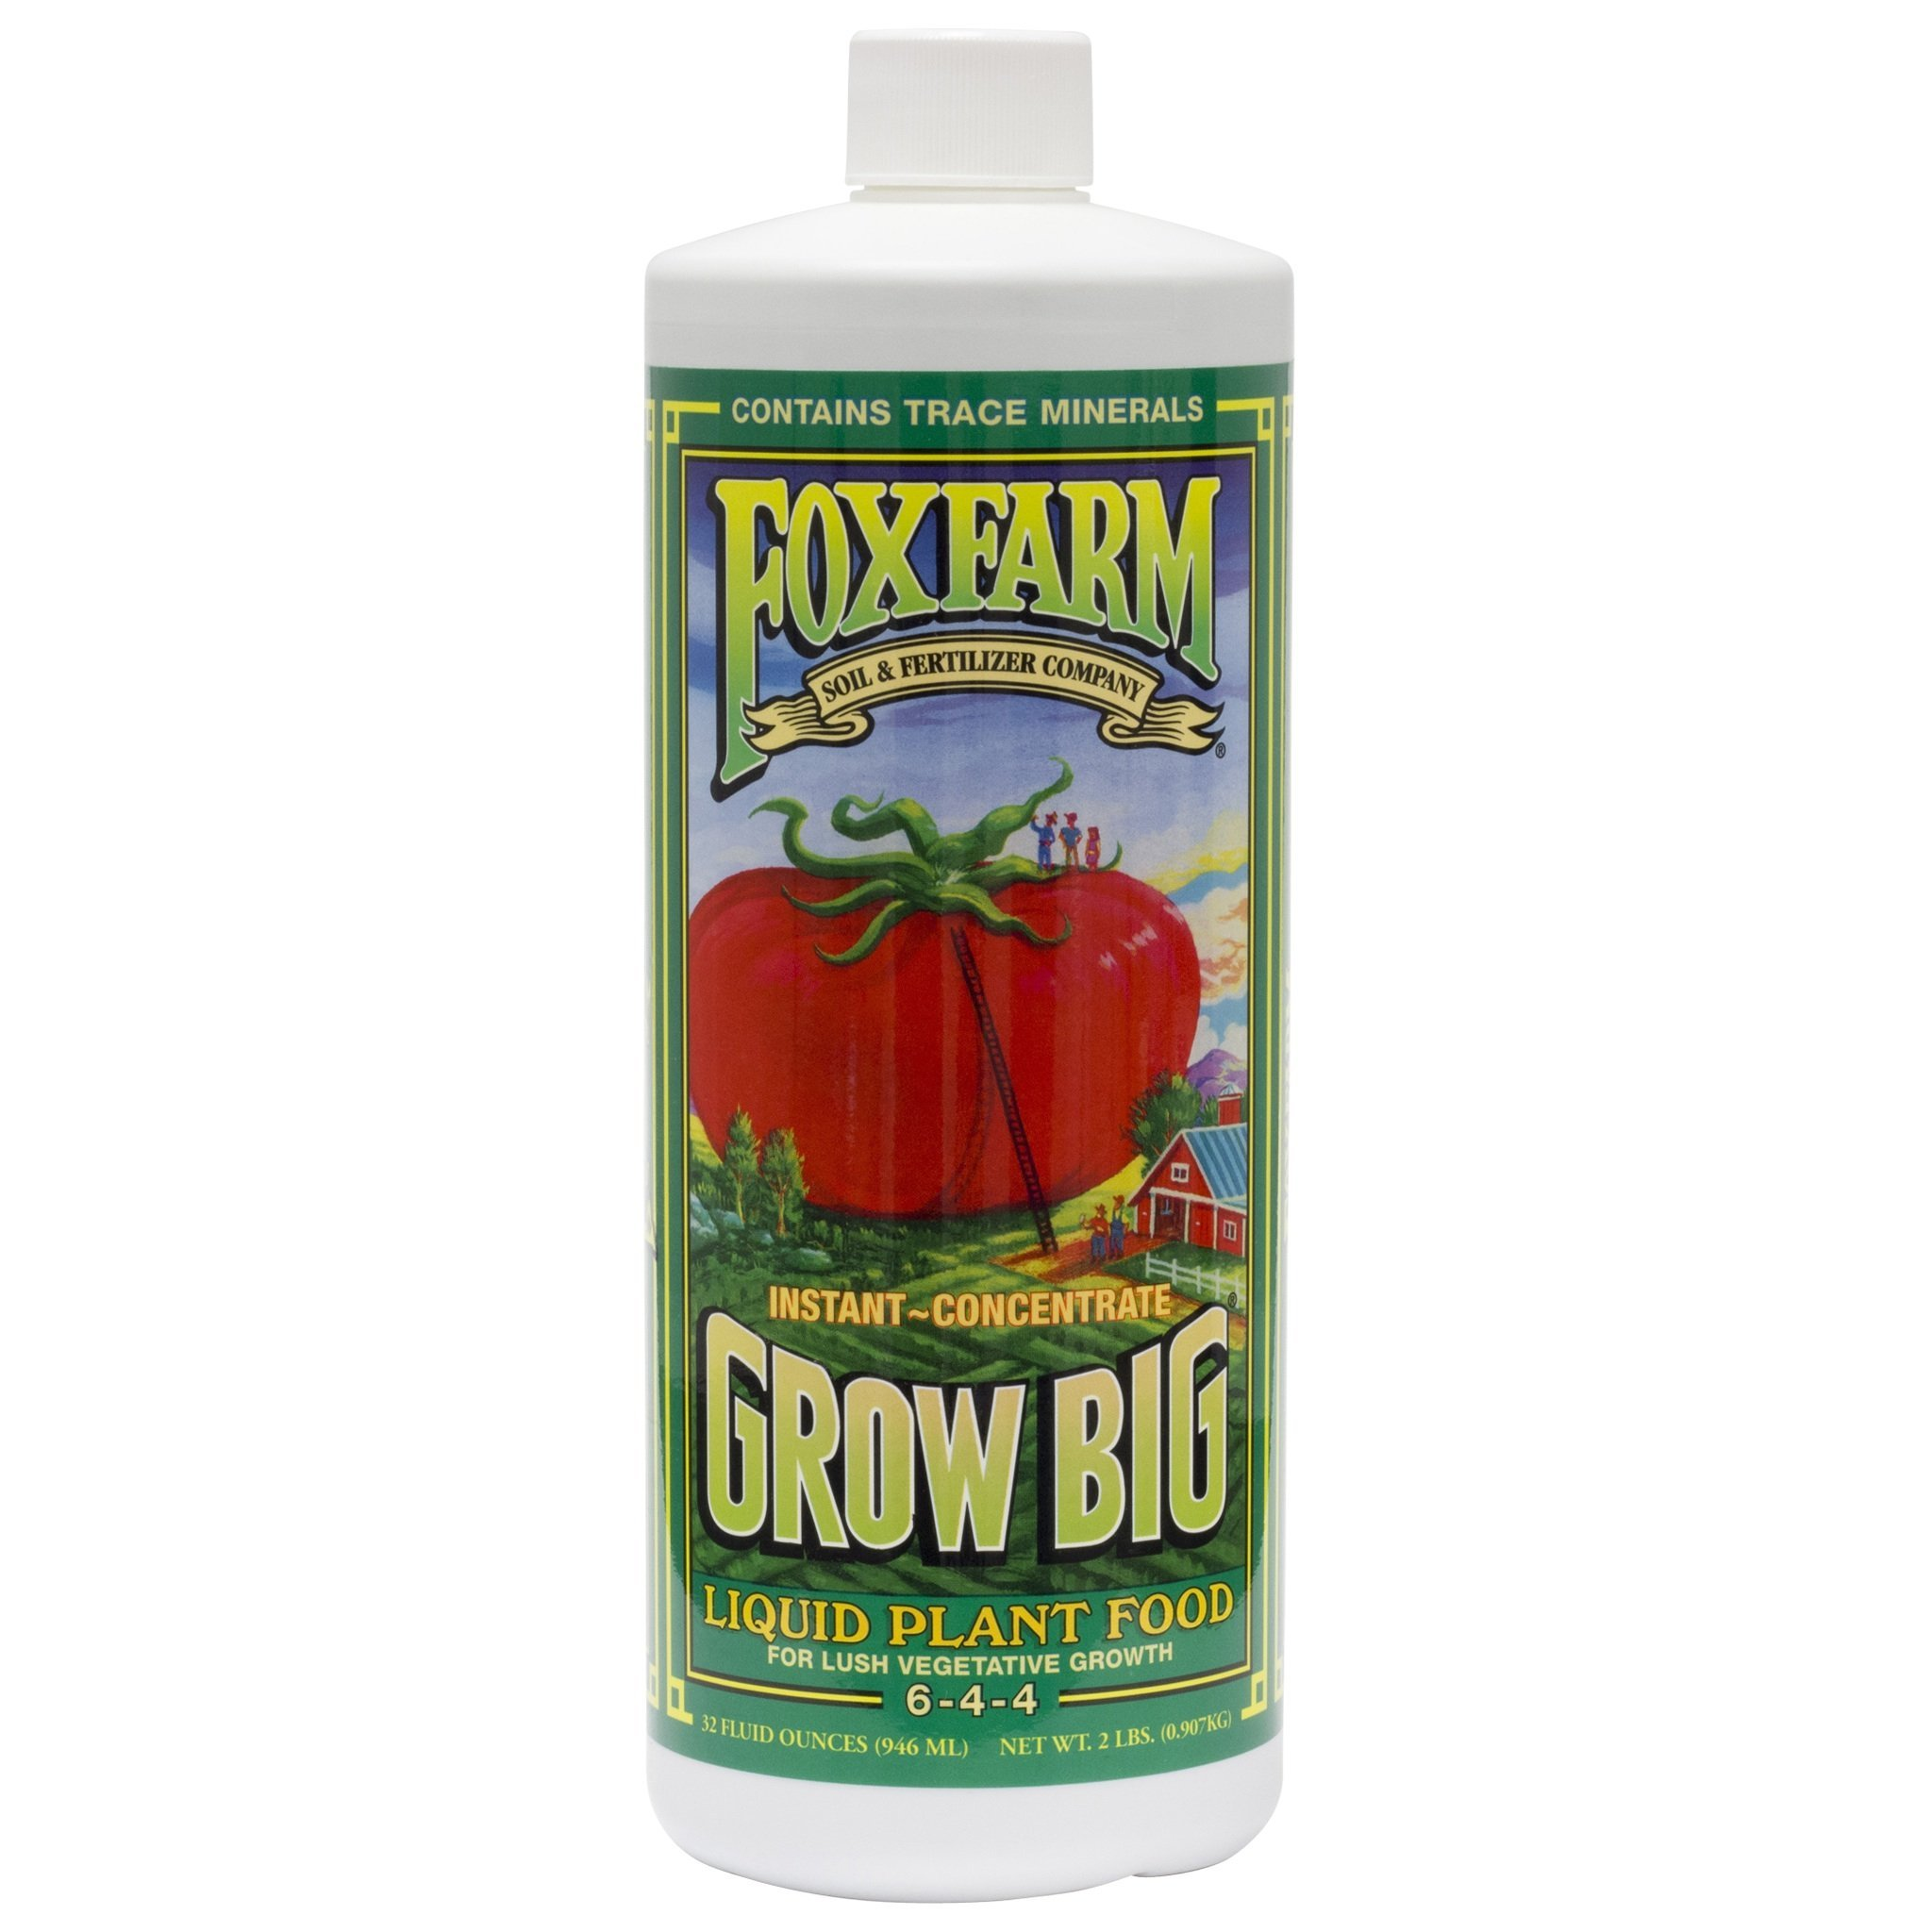 Fox Farm FX14006 1-Quart FoxFarm Grow Big Liquid Concentrate 6-4-4 by Fox Farm